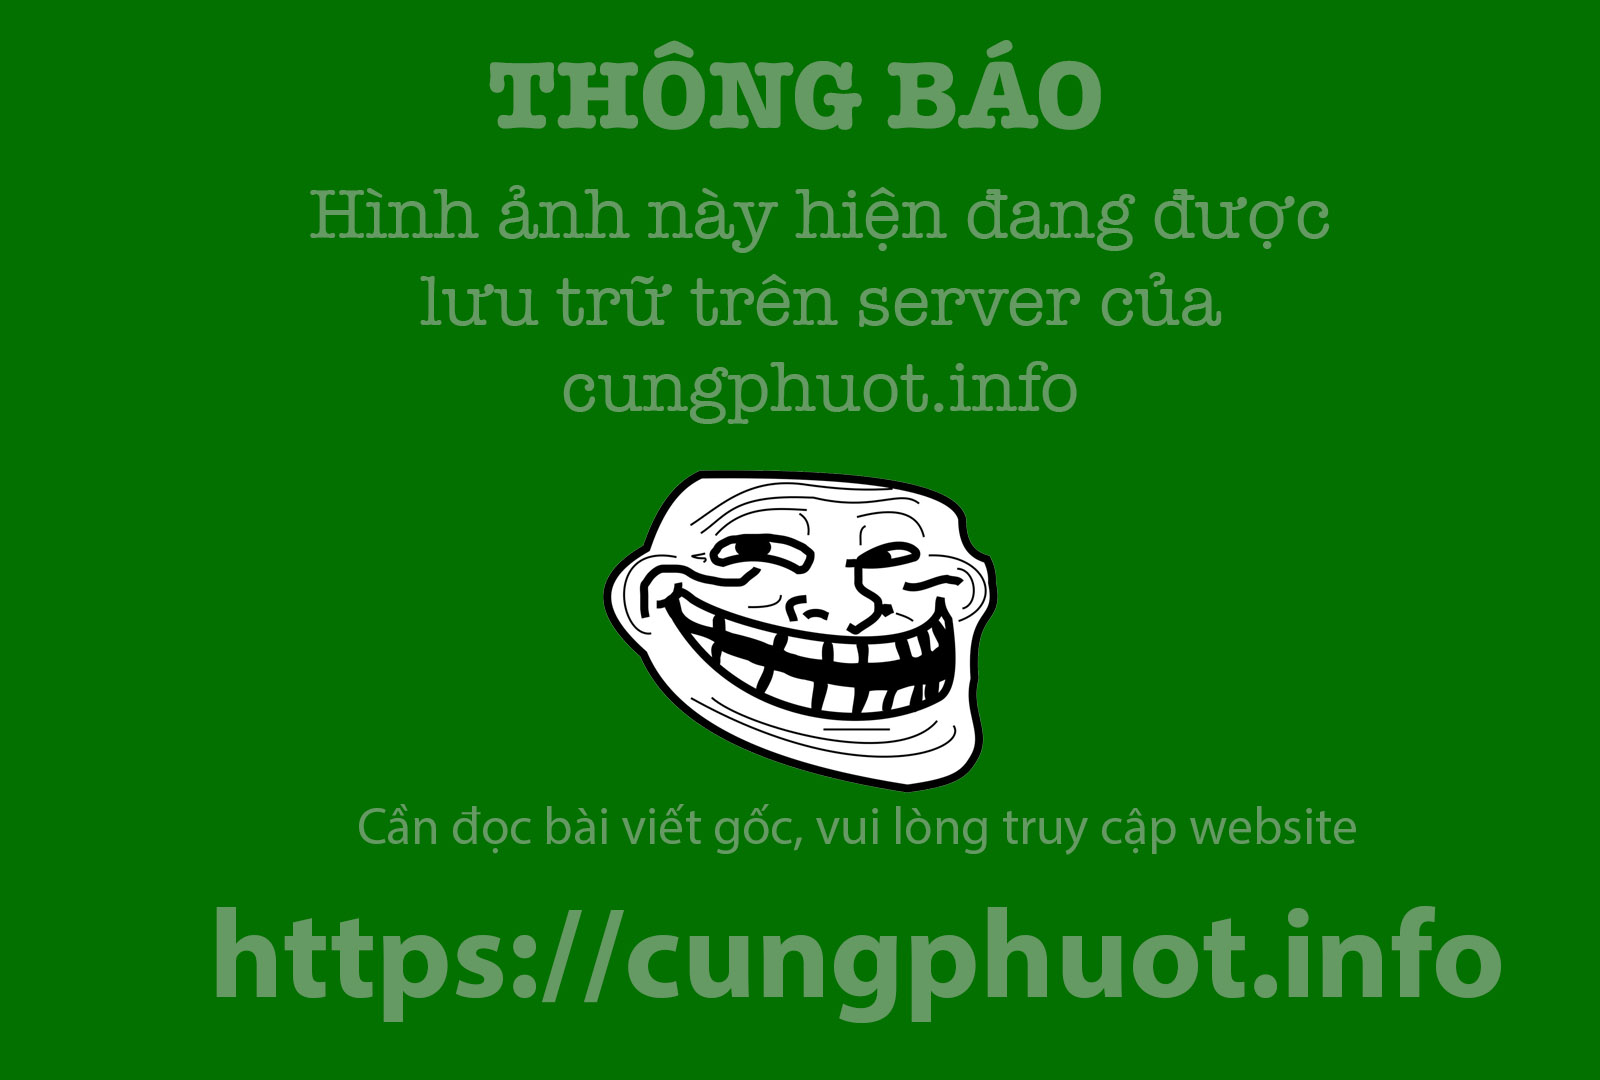 Hotels and Motels in Van Don, Quang Ninh